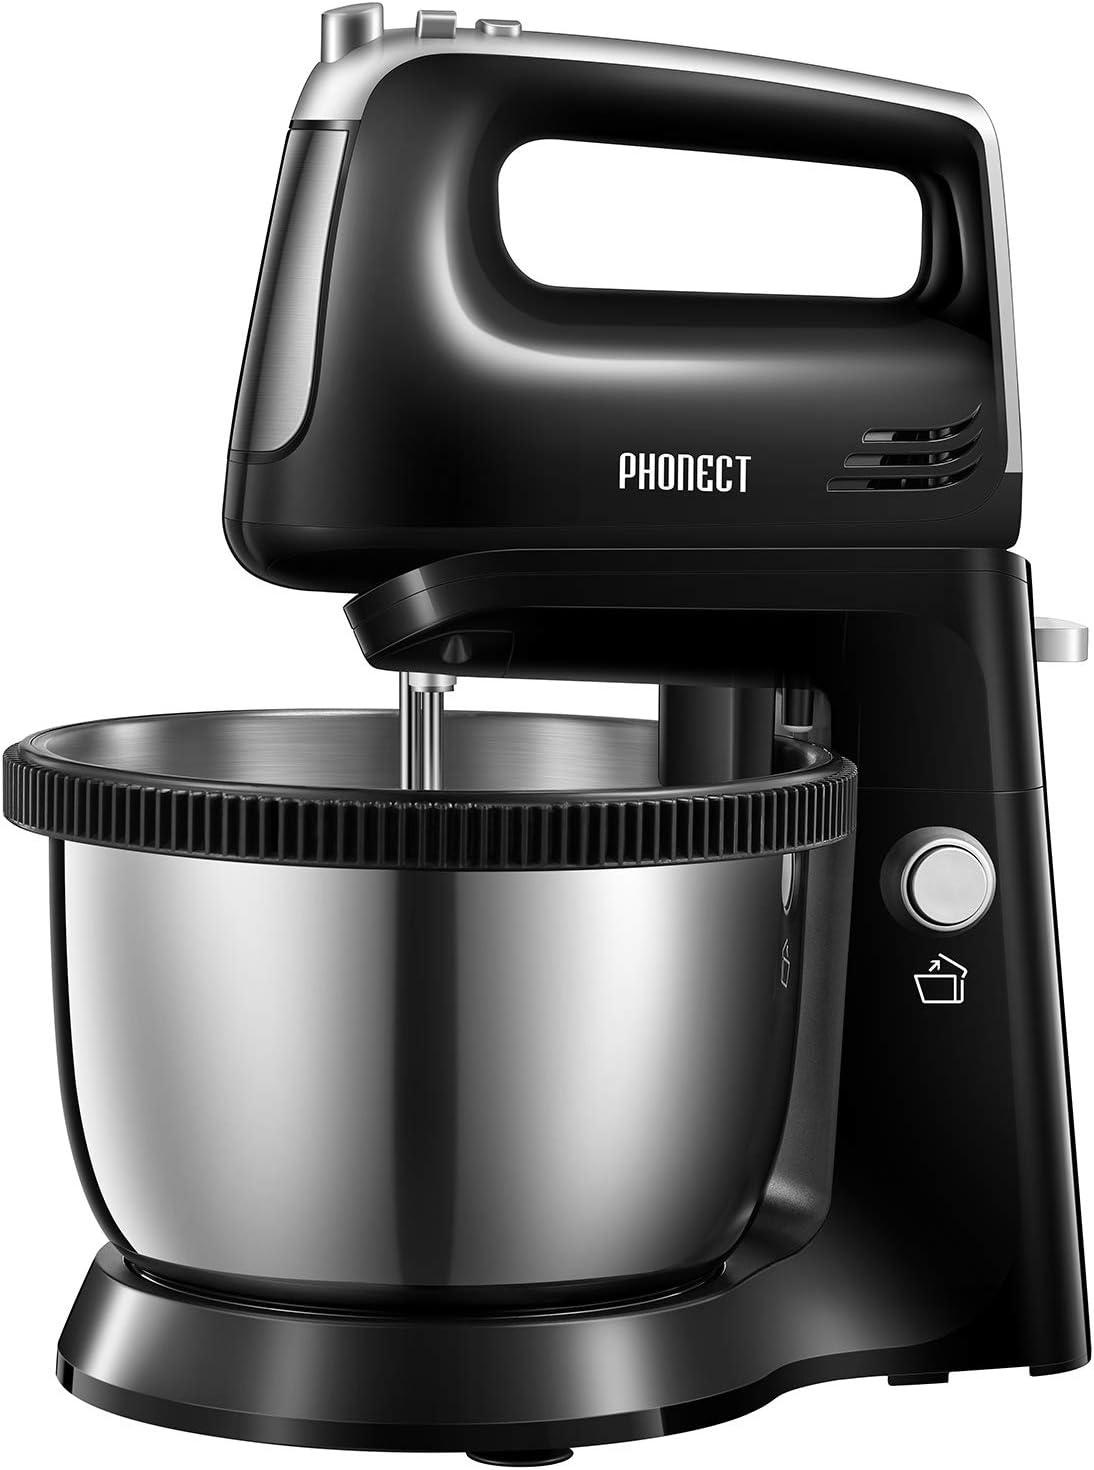 Hand Mixer Electric Detachable 3.7-Quart 返品不可 Includes Stand St テレビで話題